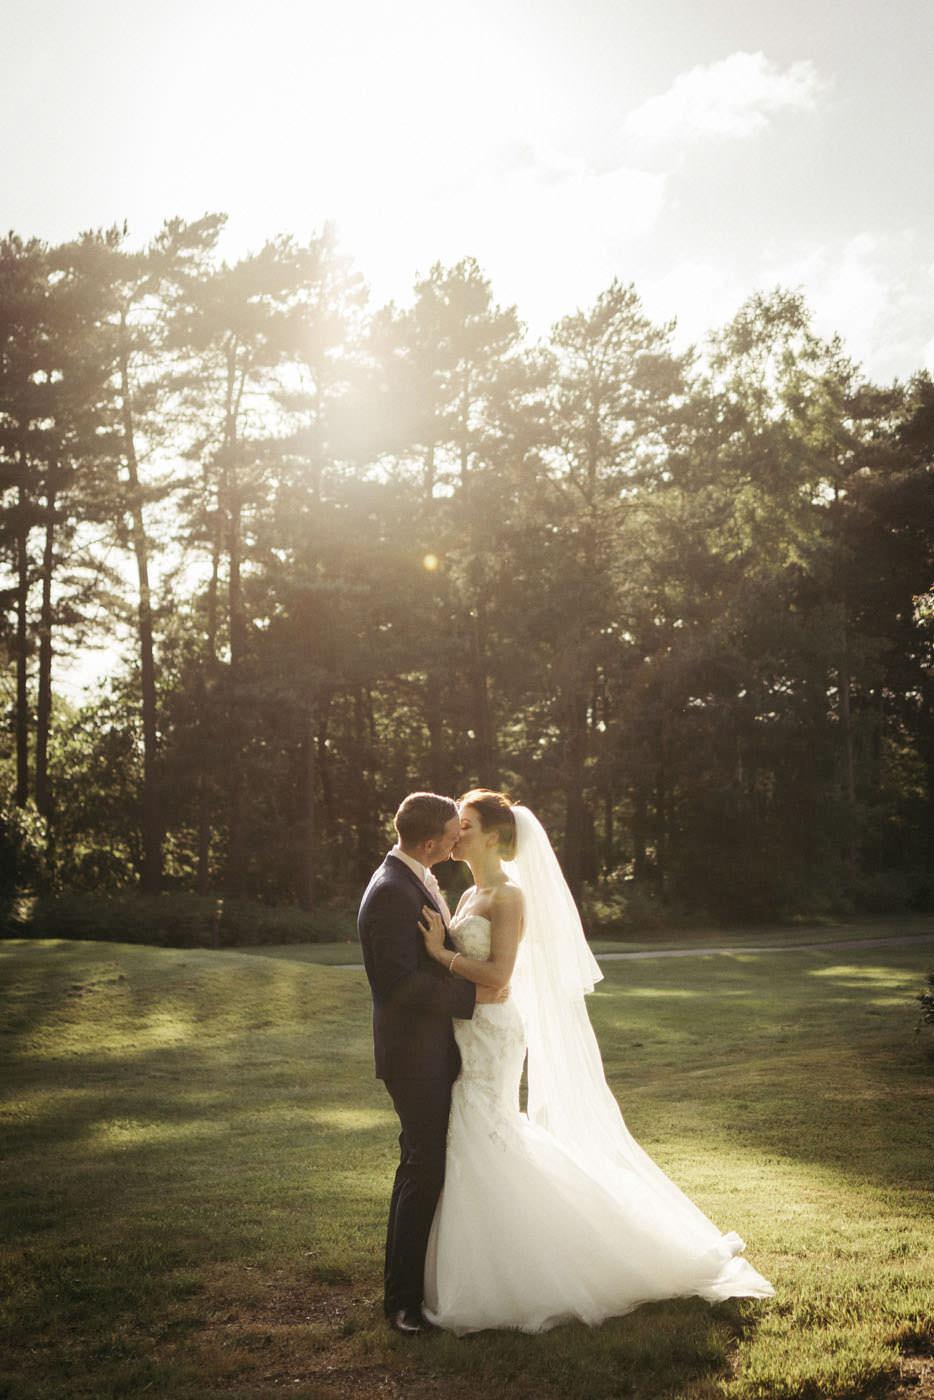 lukeemily foxhills wedding photographer 0129